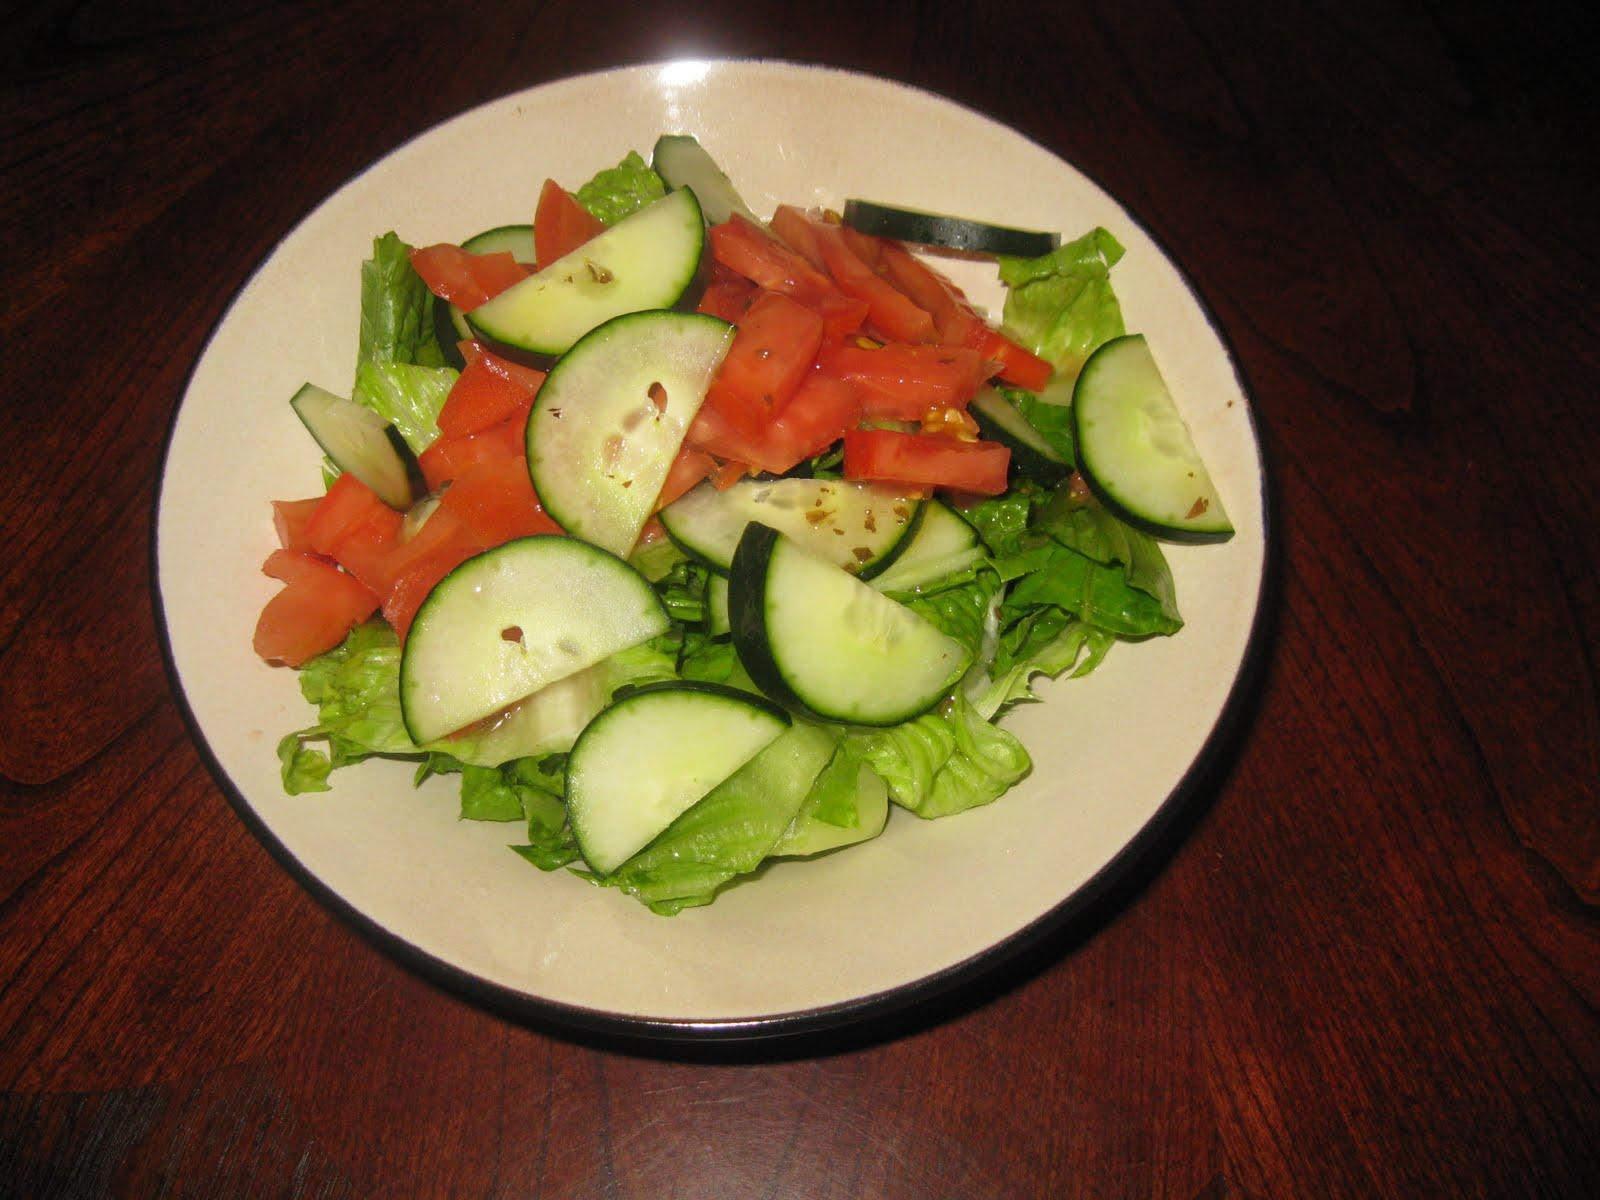 The Vegan Challenge: Day 47: Garlic Spread